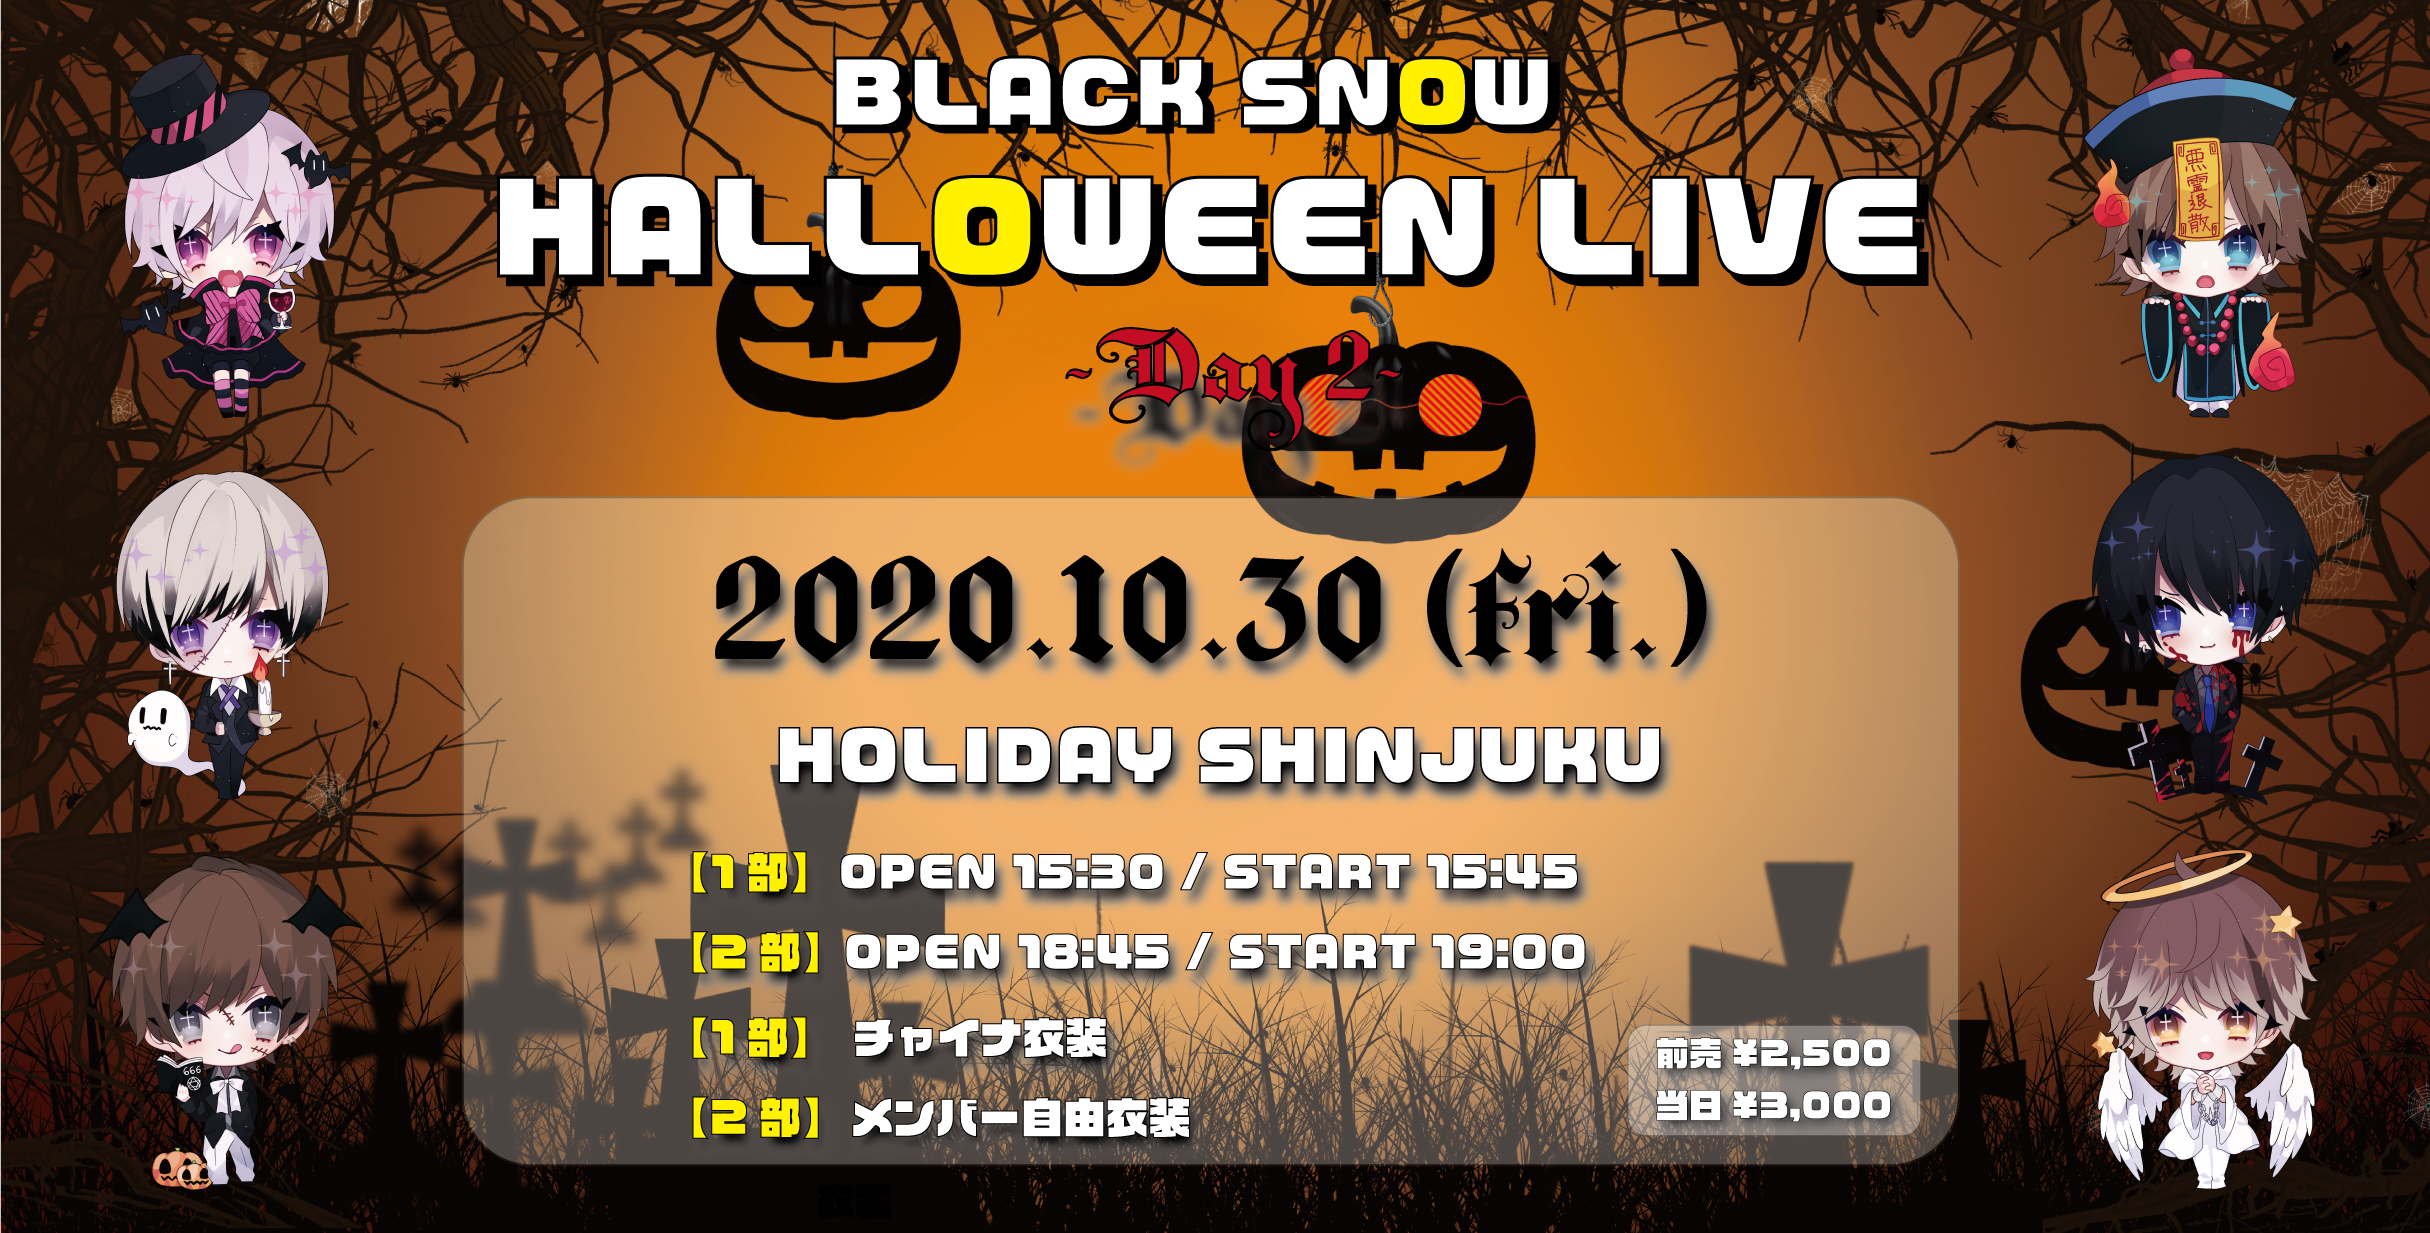 BLACK SNOW HALLOWEEN LIVE 〜Day2〜【2部】